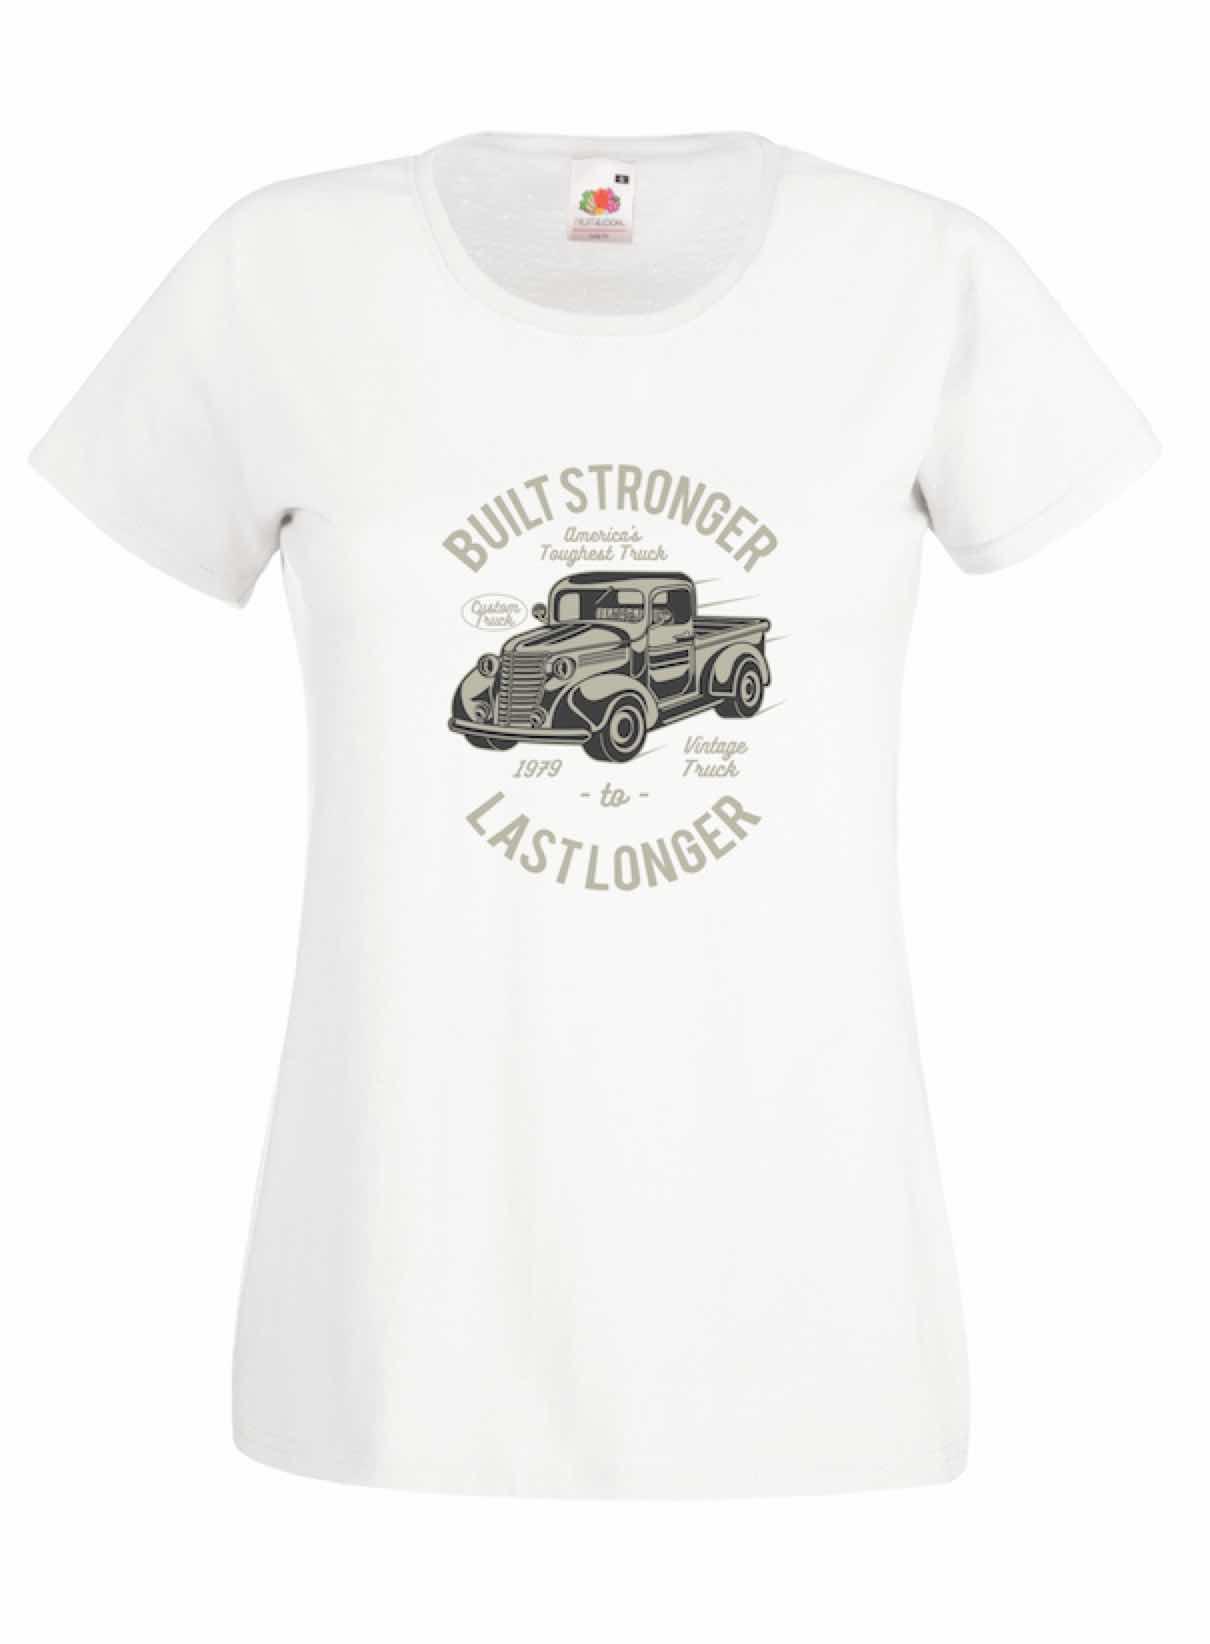 Built Stronger design for t-shirt, hoodie & sweatshirt